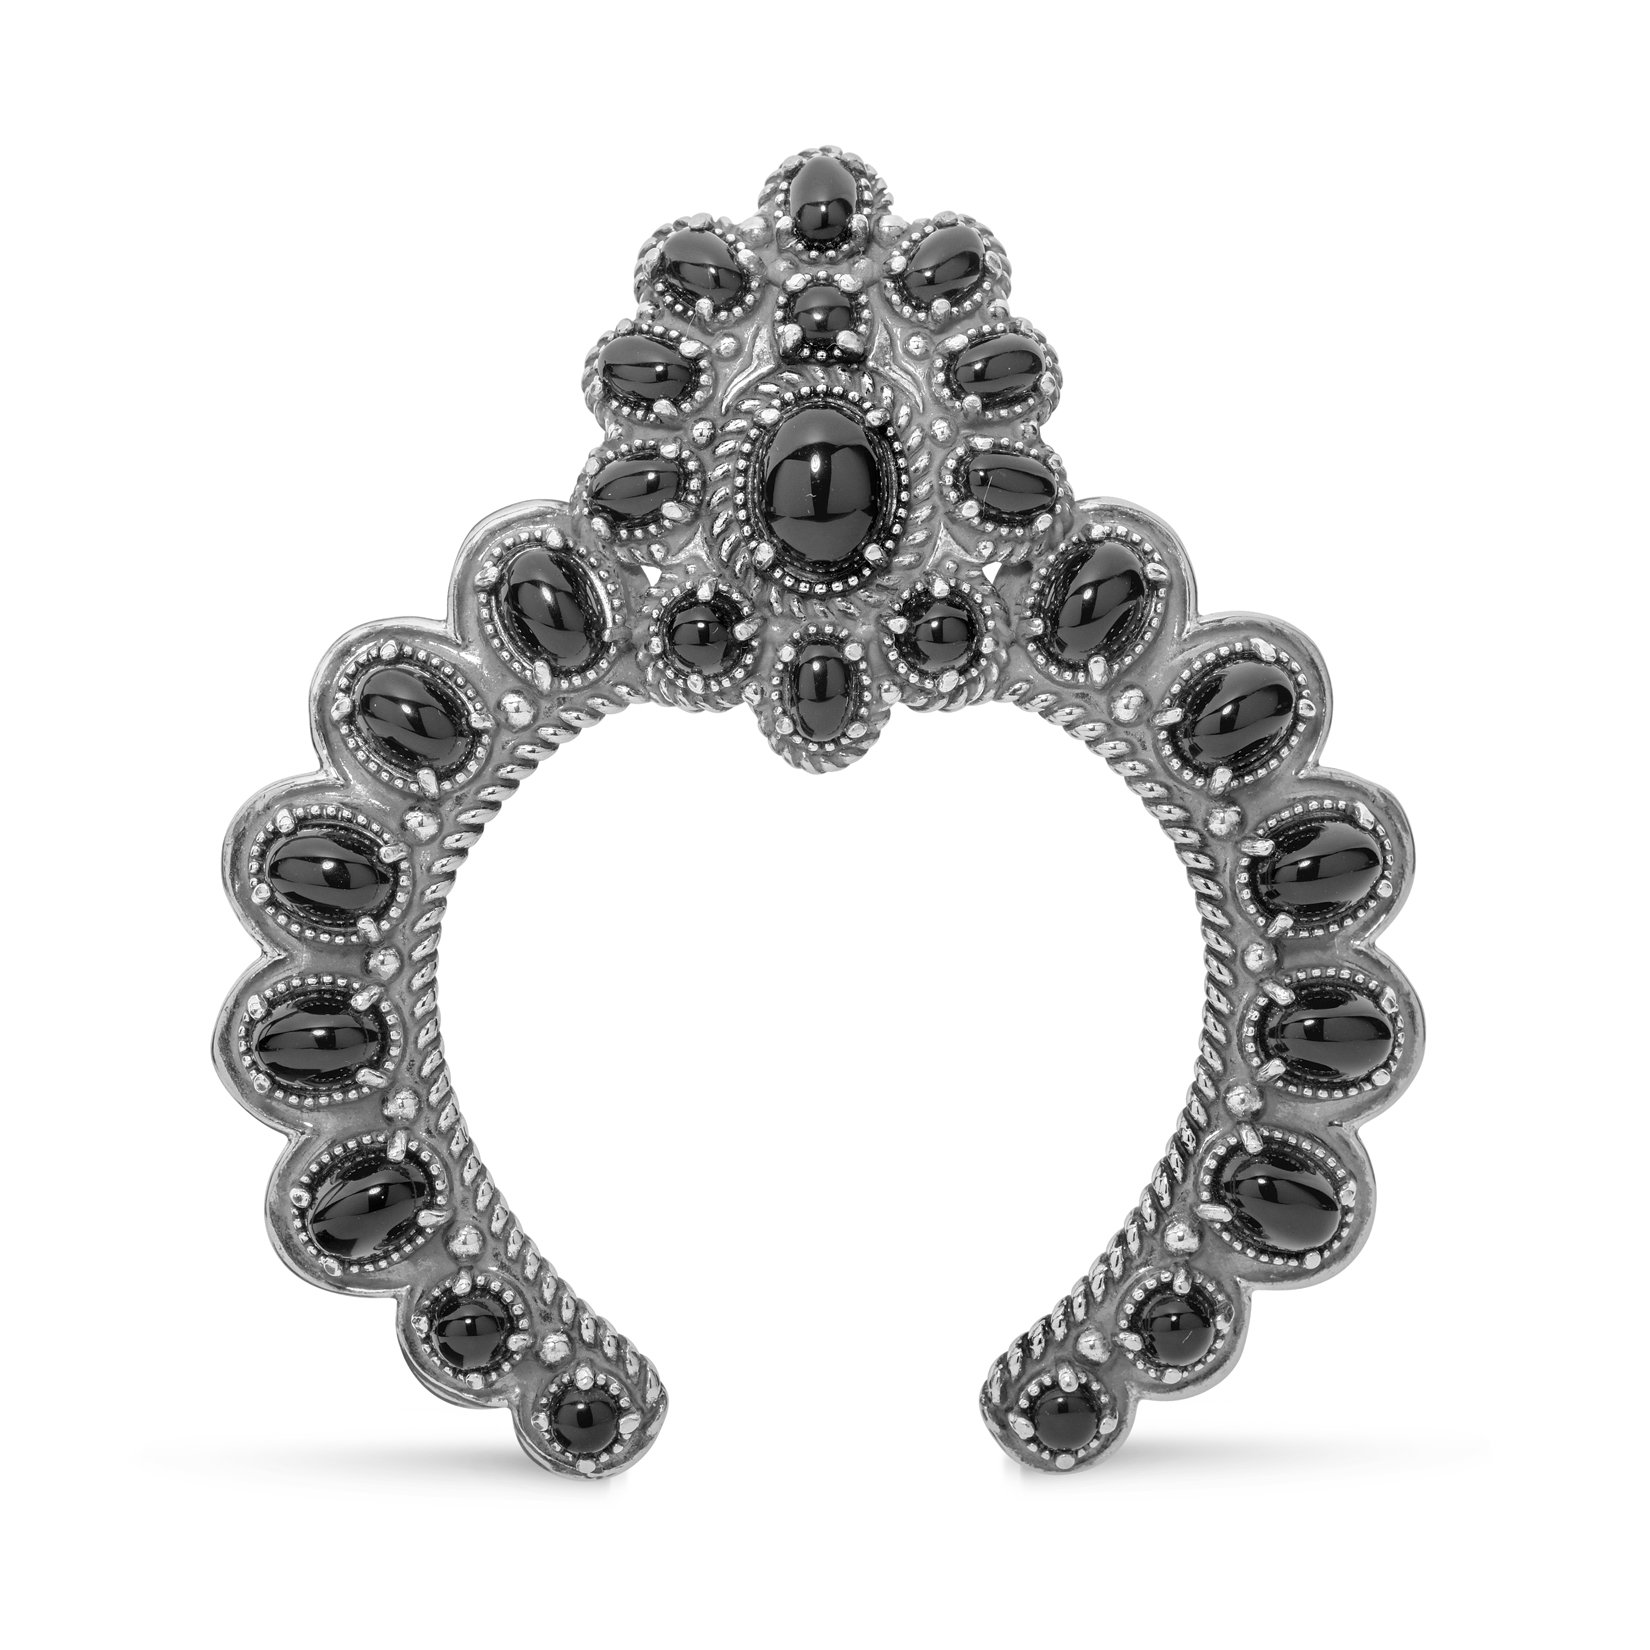 American West Sterling Silver Black Agate Gemstone Naja Pendant Enhancer by American West Jewelry